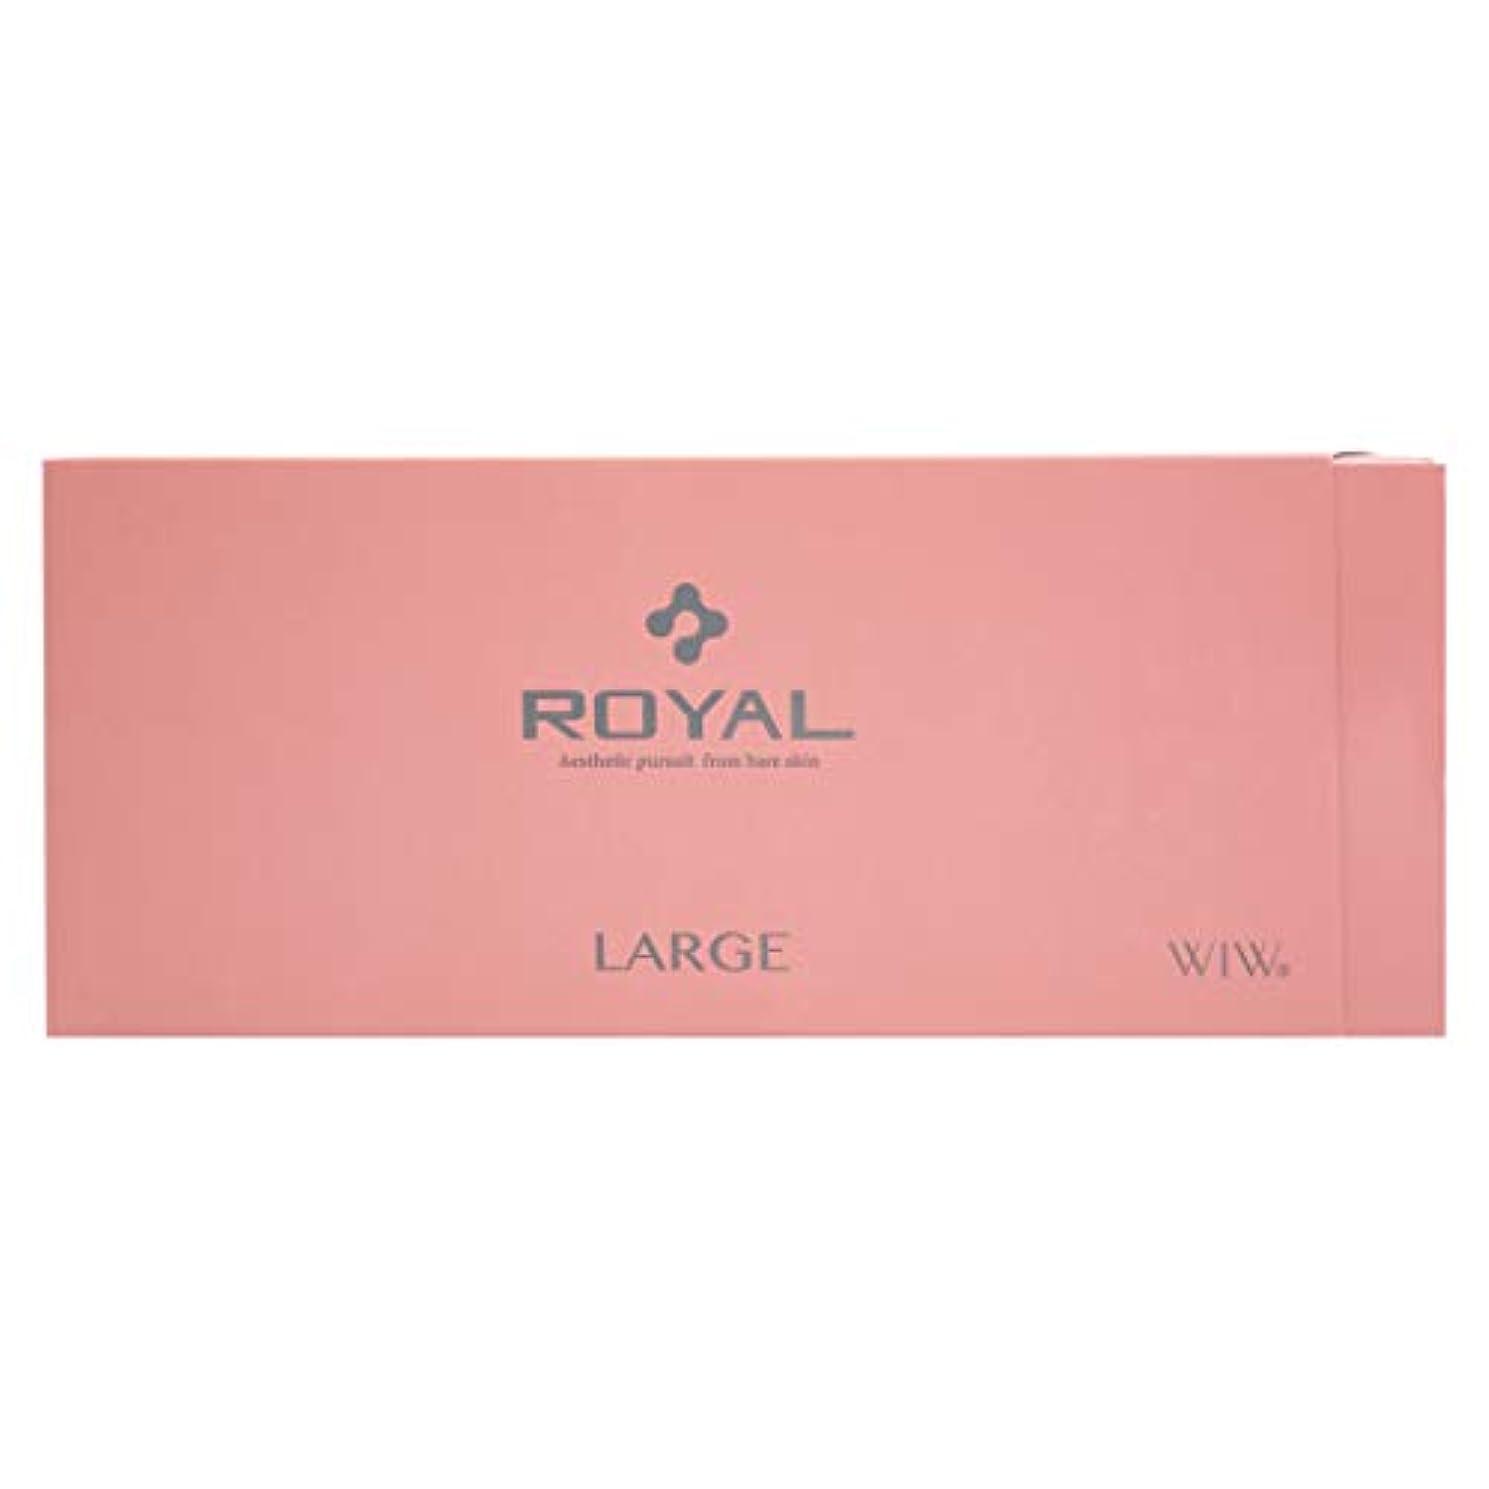 WIW ROYAL ロイアルラージ 1.3ml×90袋